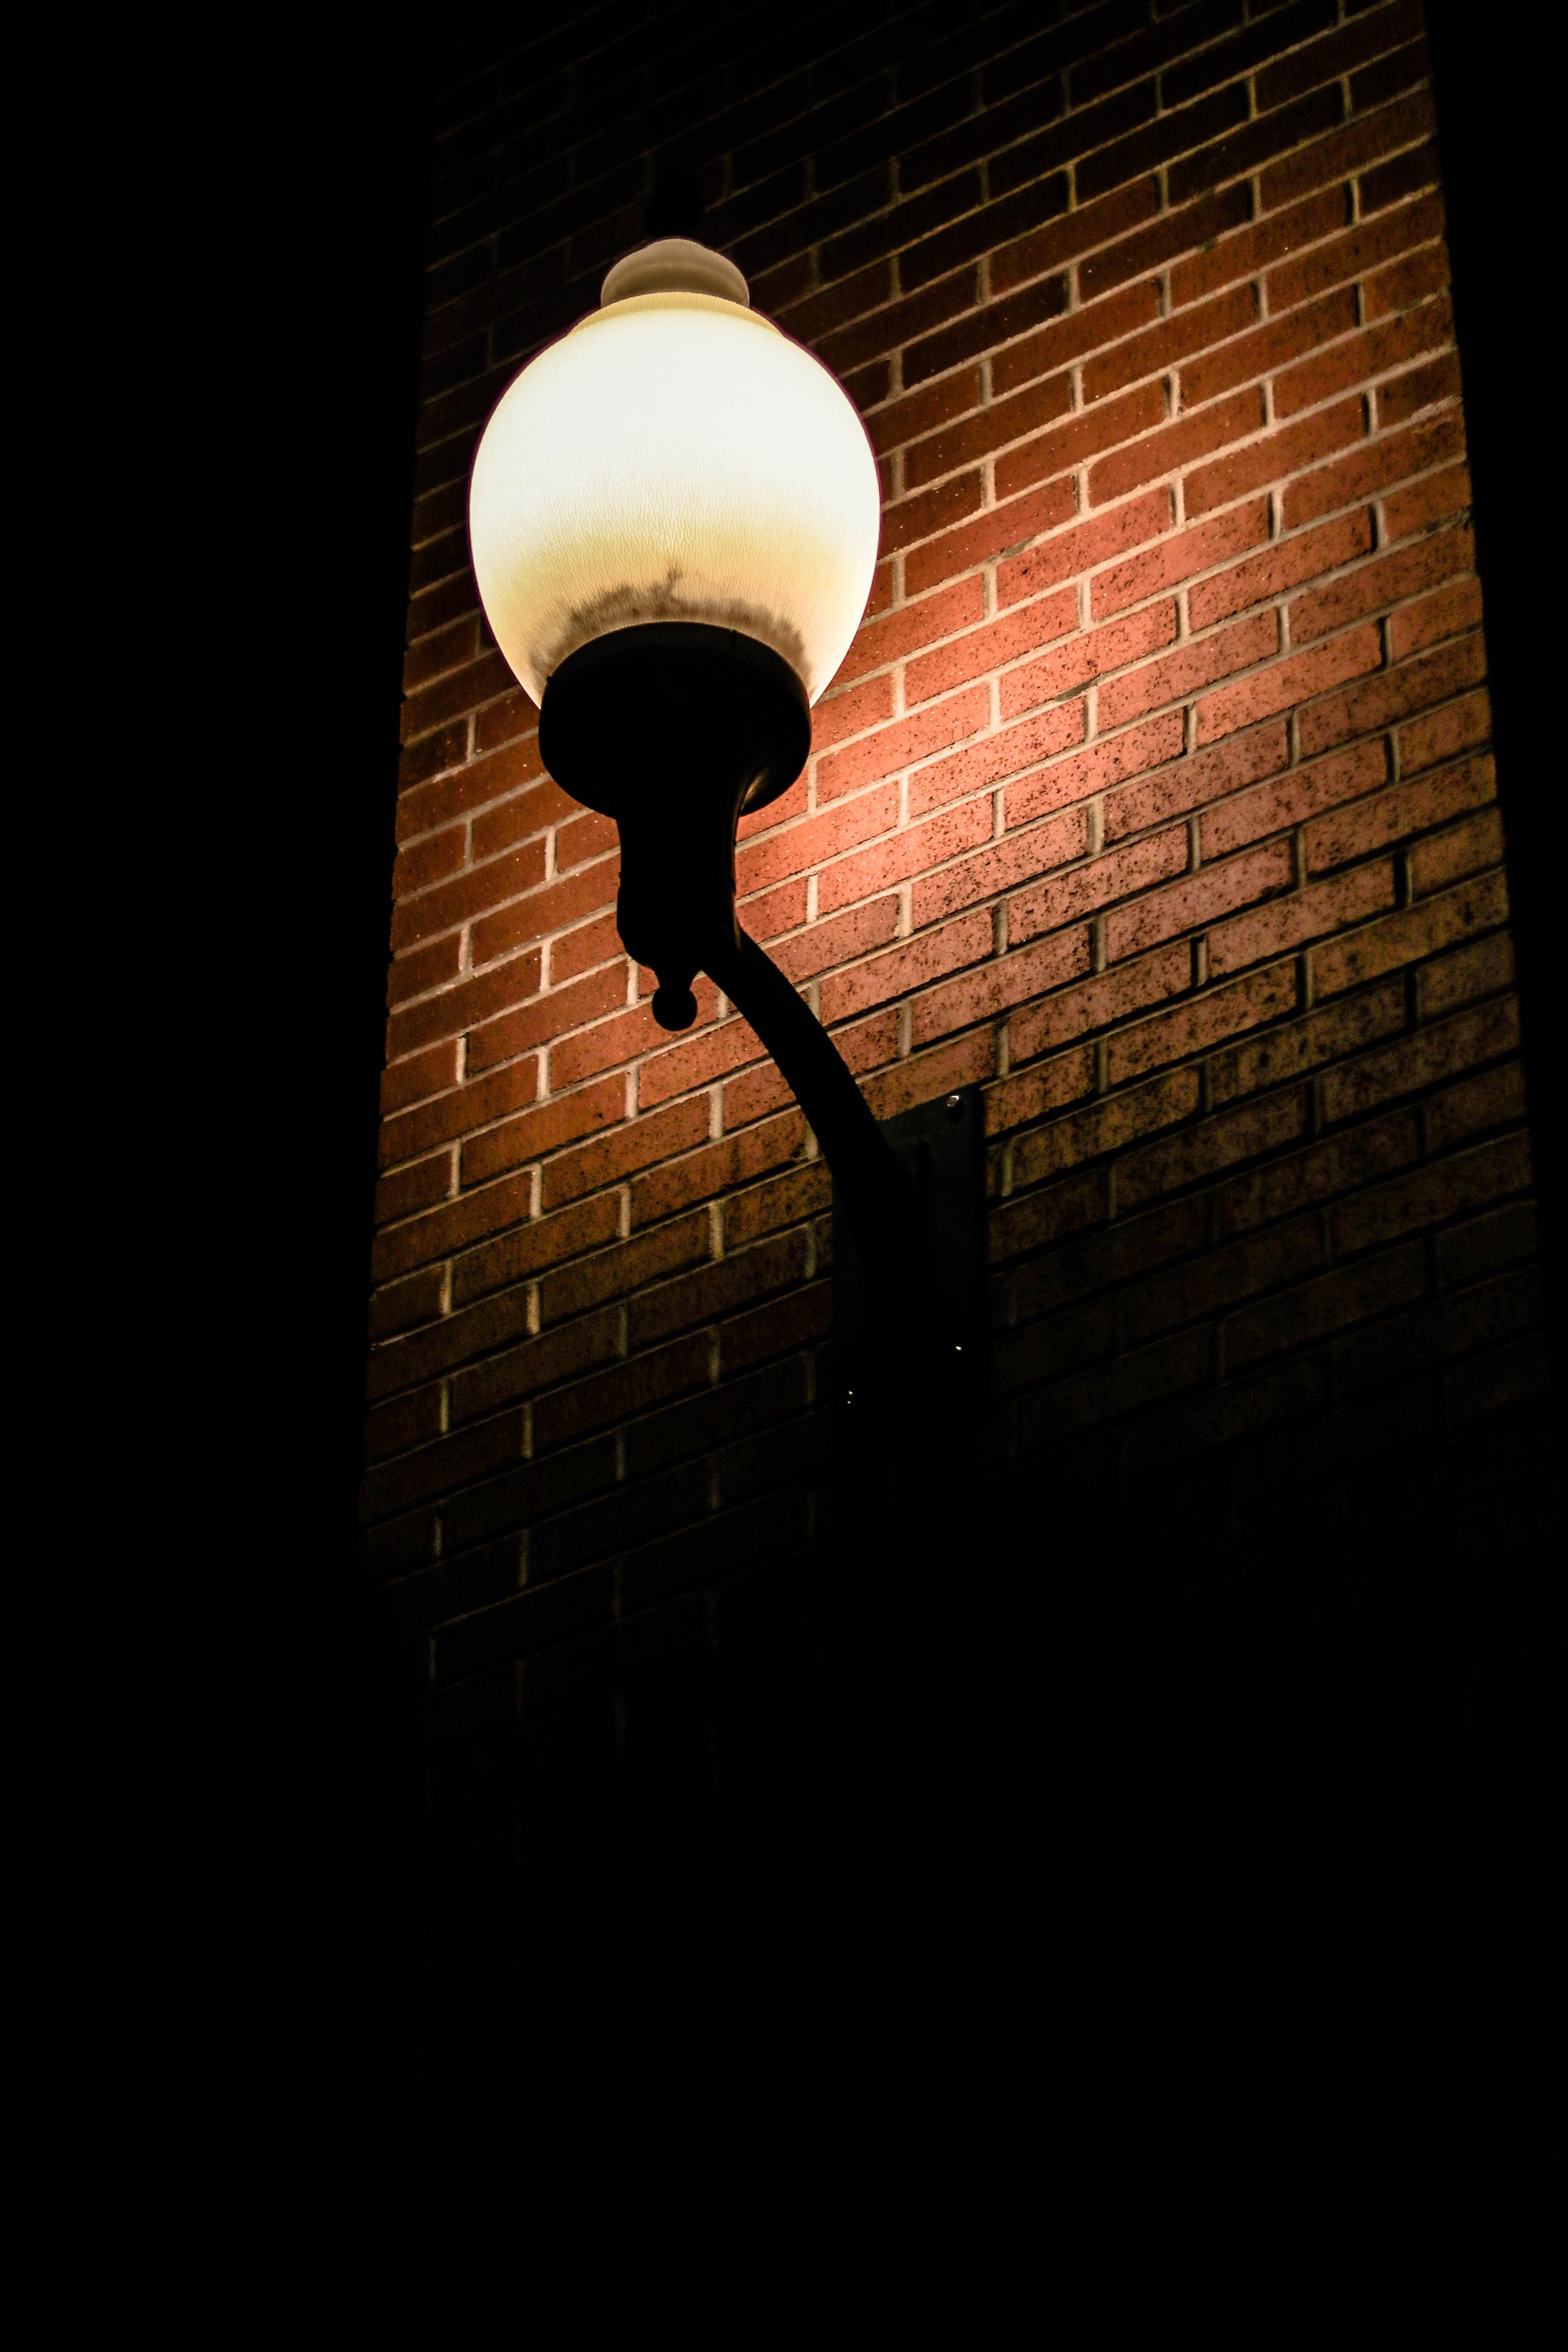 turned on lights on sconce